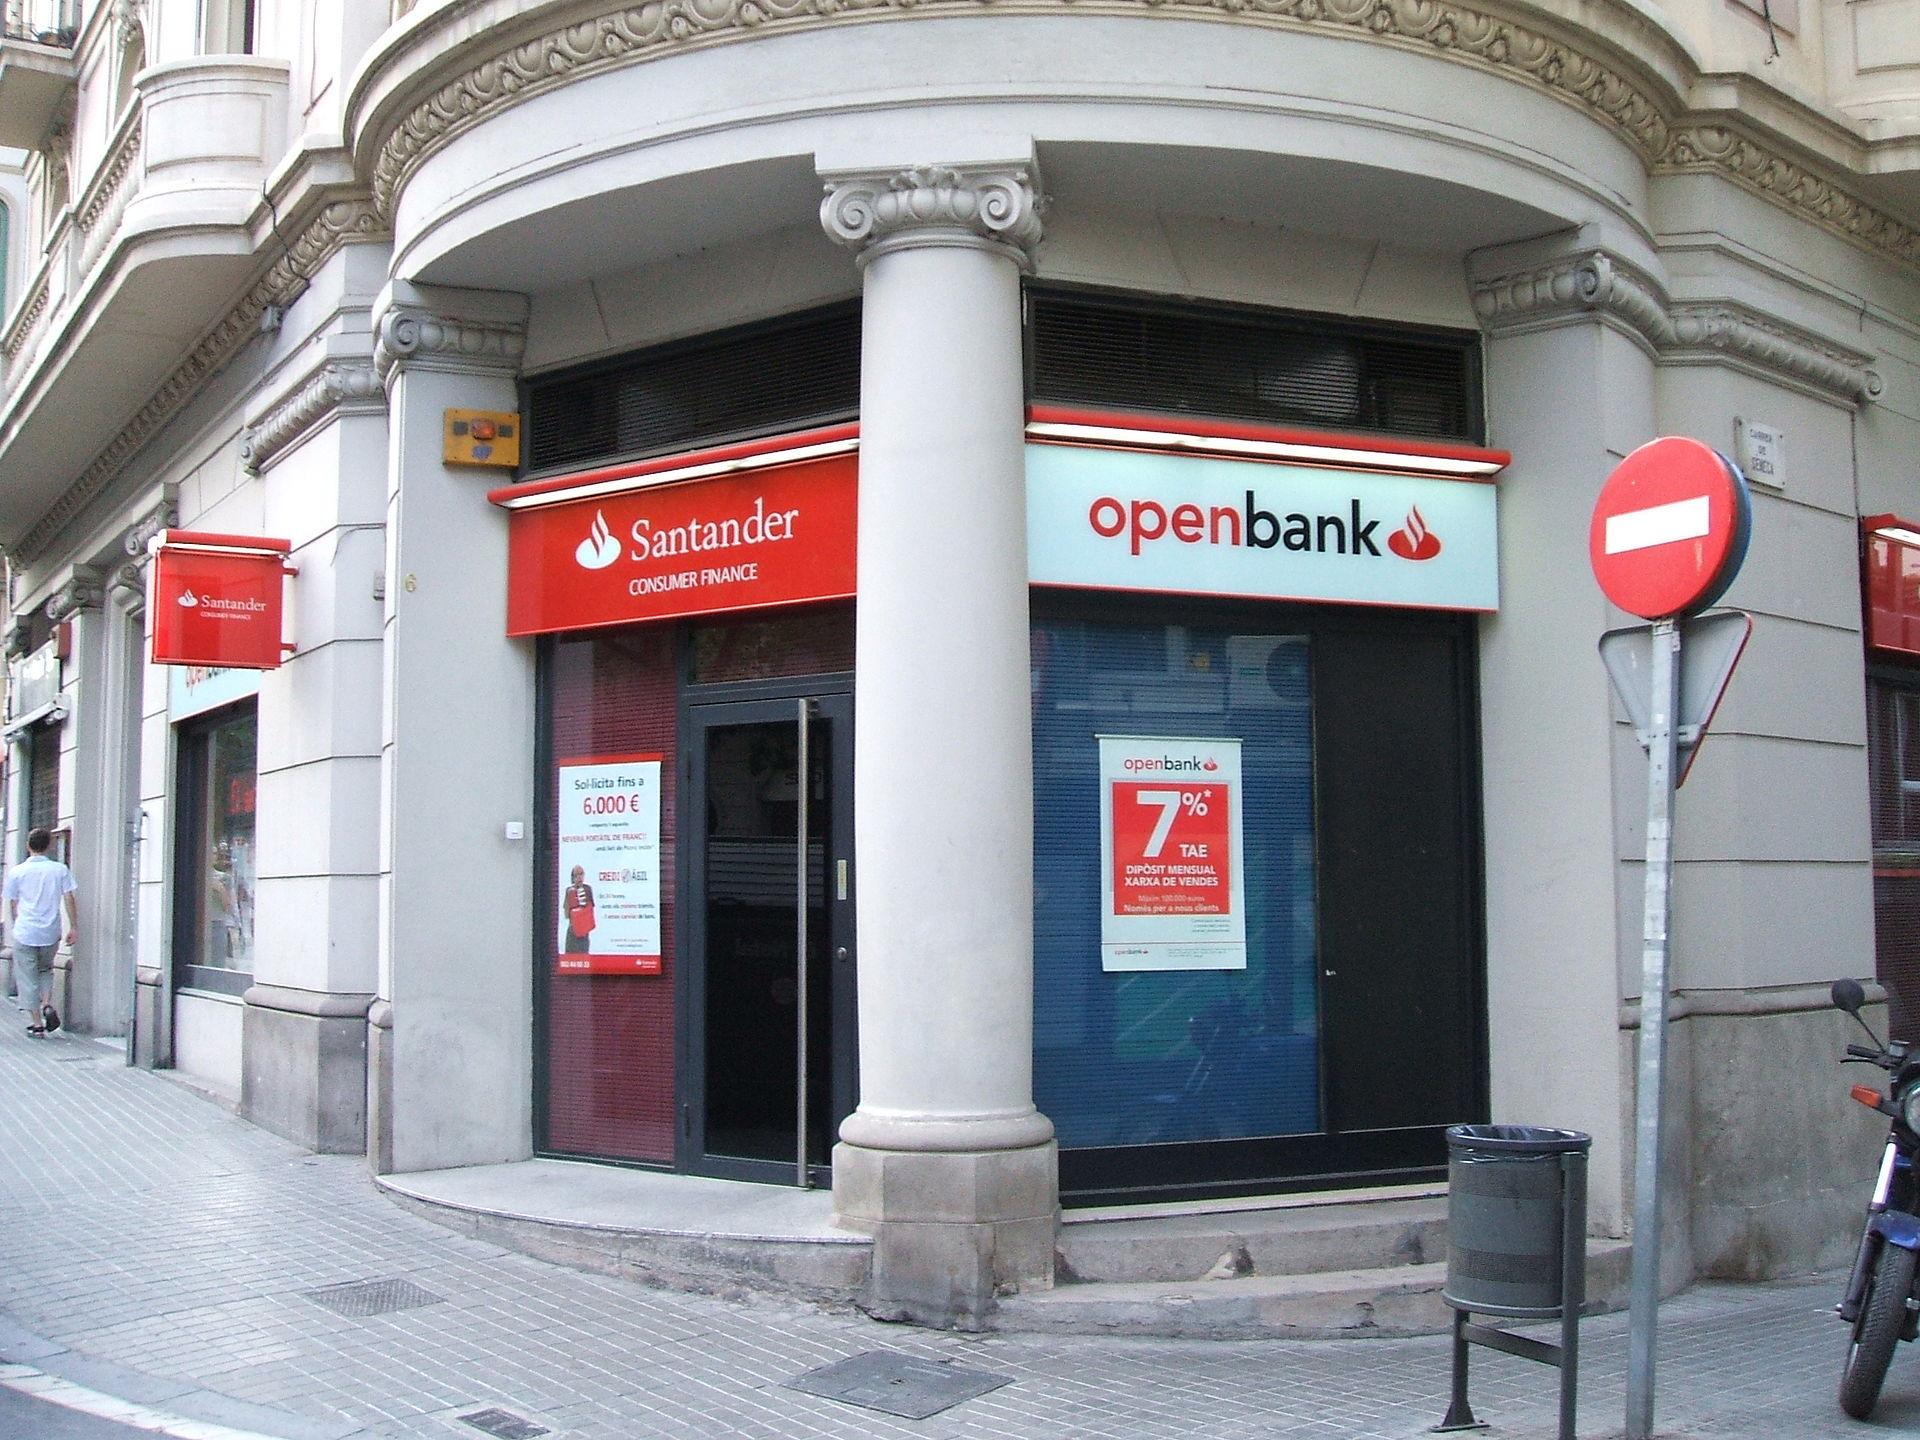 Banco santander wikipedia - Pisos santander central hispano ...